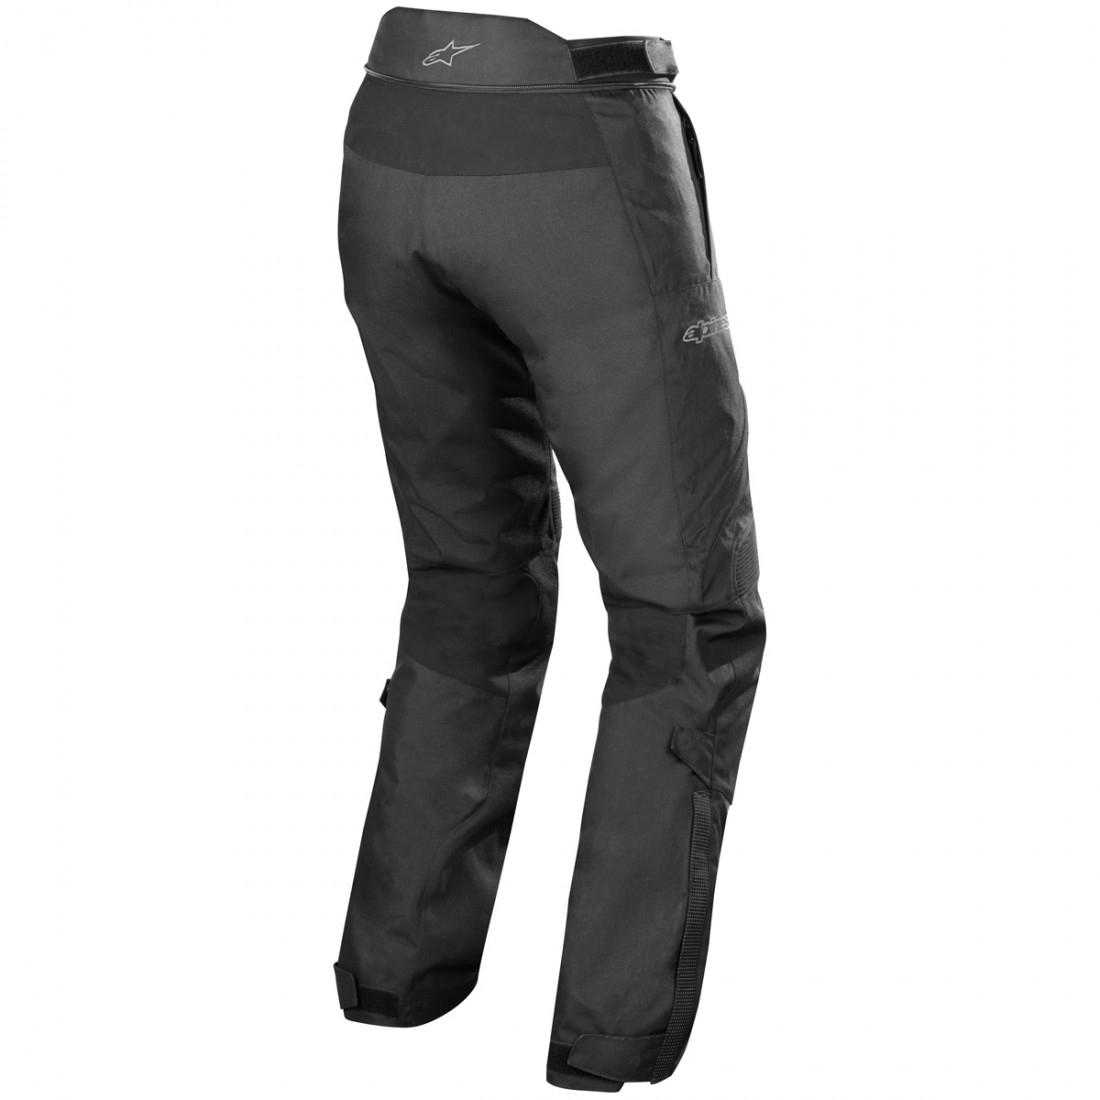 e4503613c1c Pantalon ALPINESTARS Stella Hyper Drystar Lady Black · Motocard